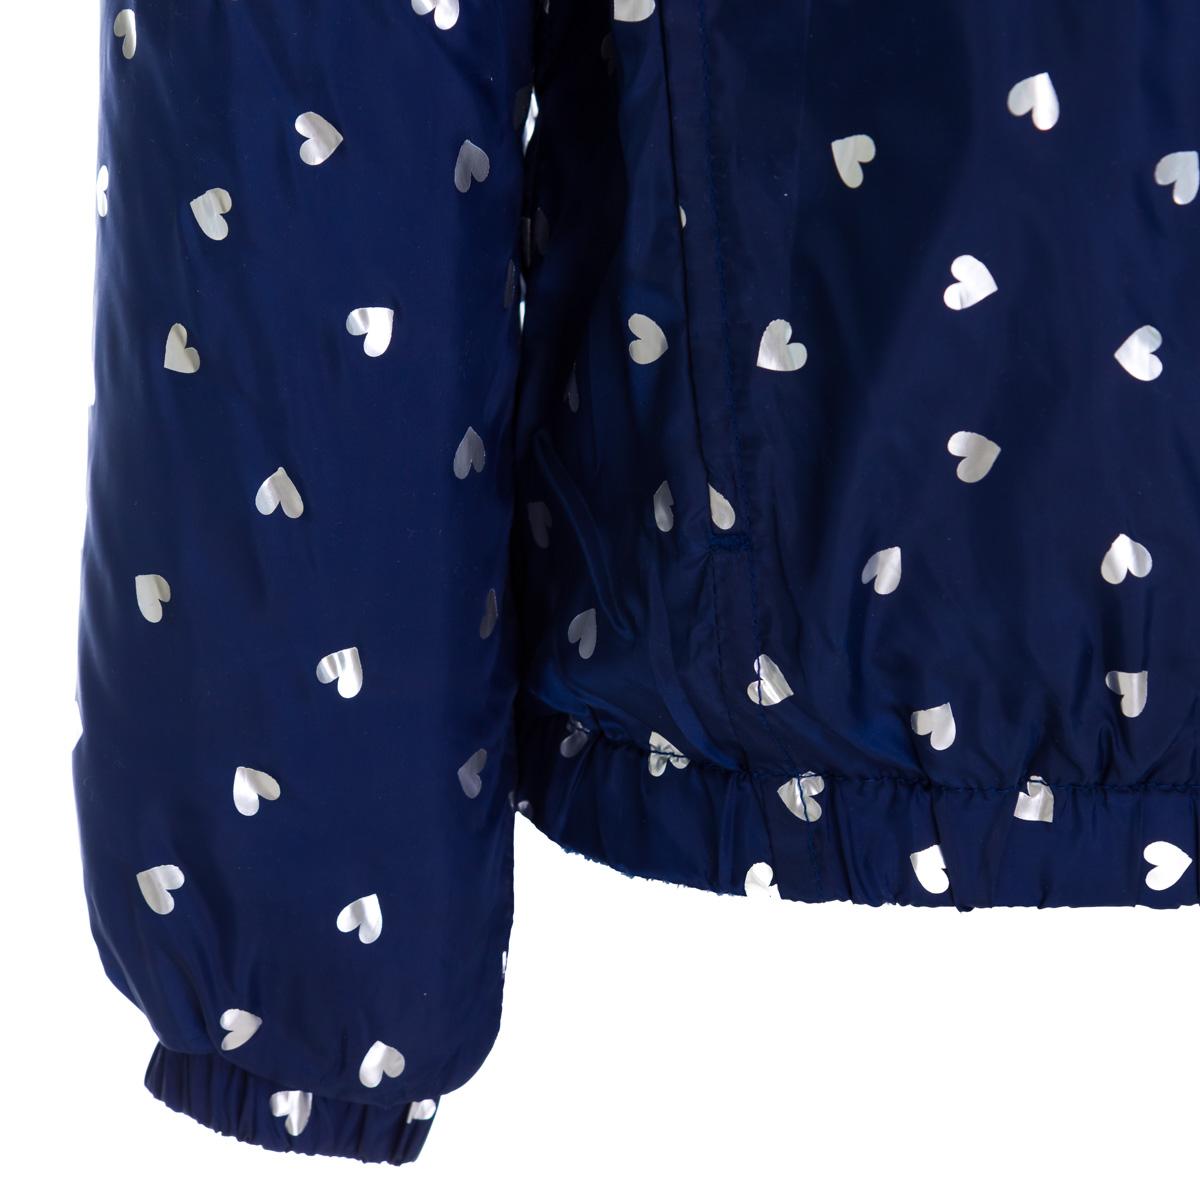 Купить Верхняя одежда, Ветровка BluKids Small heart Blue, р. 110 5560715 ТМ: BluKids, синий